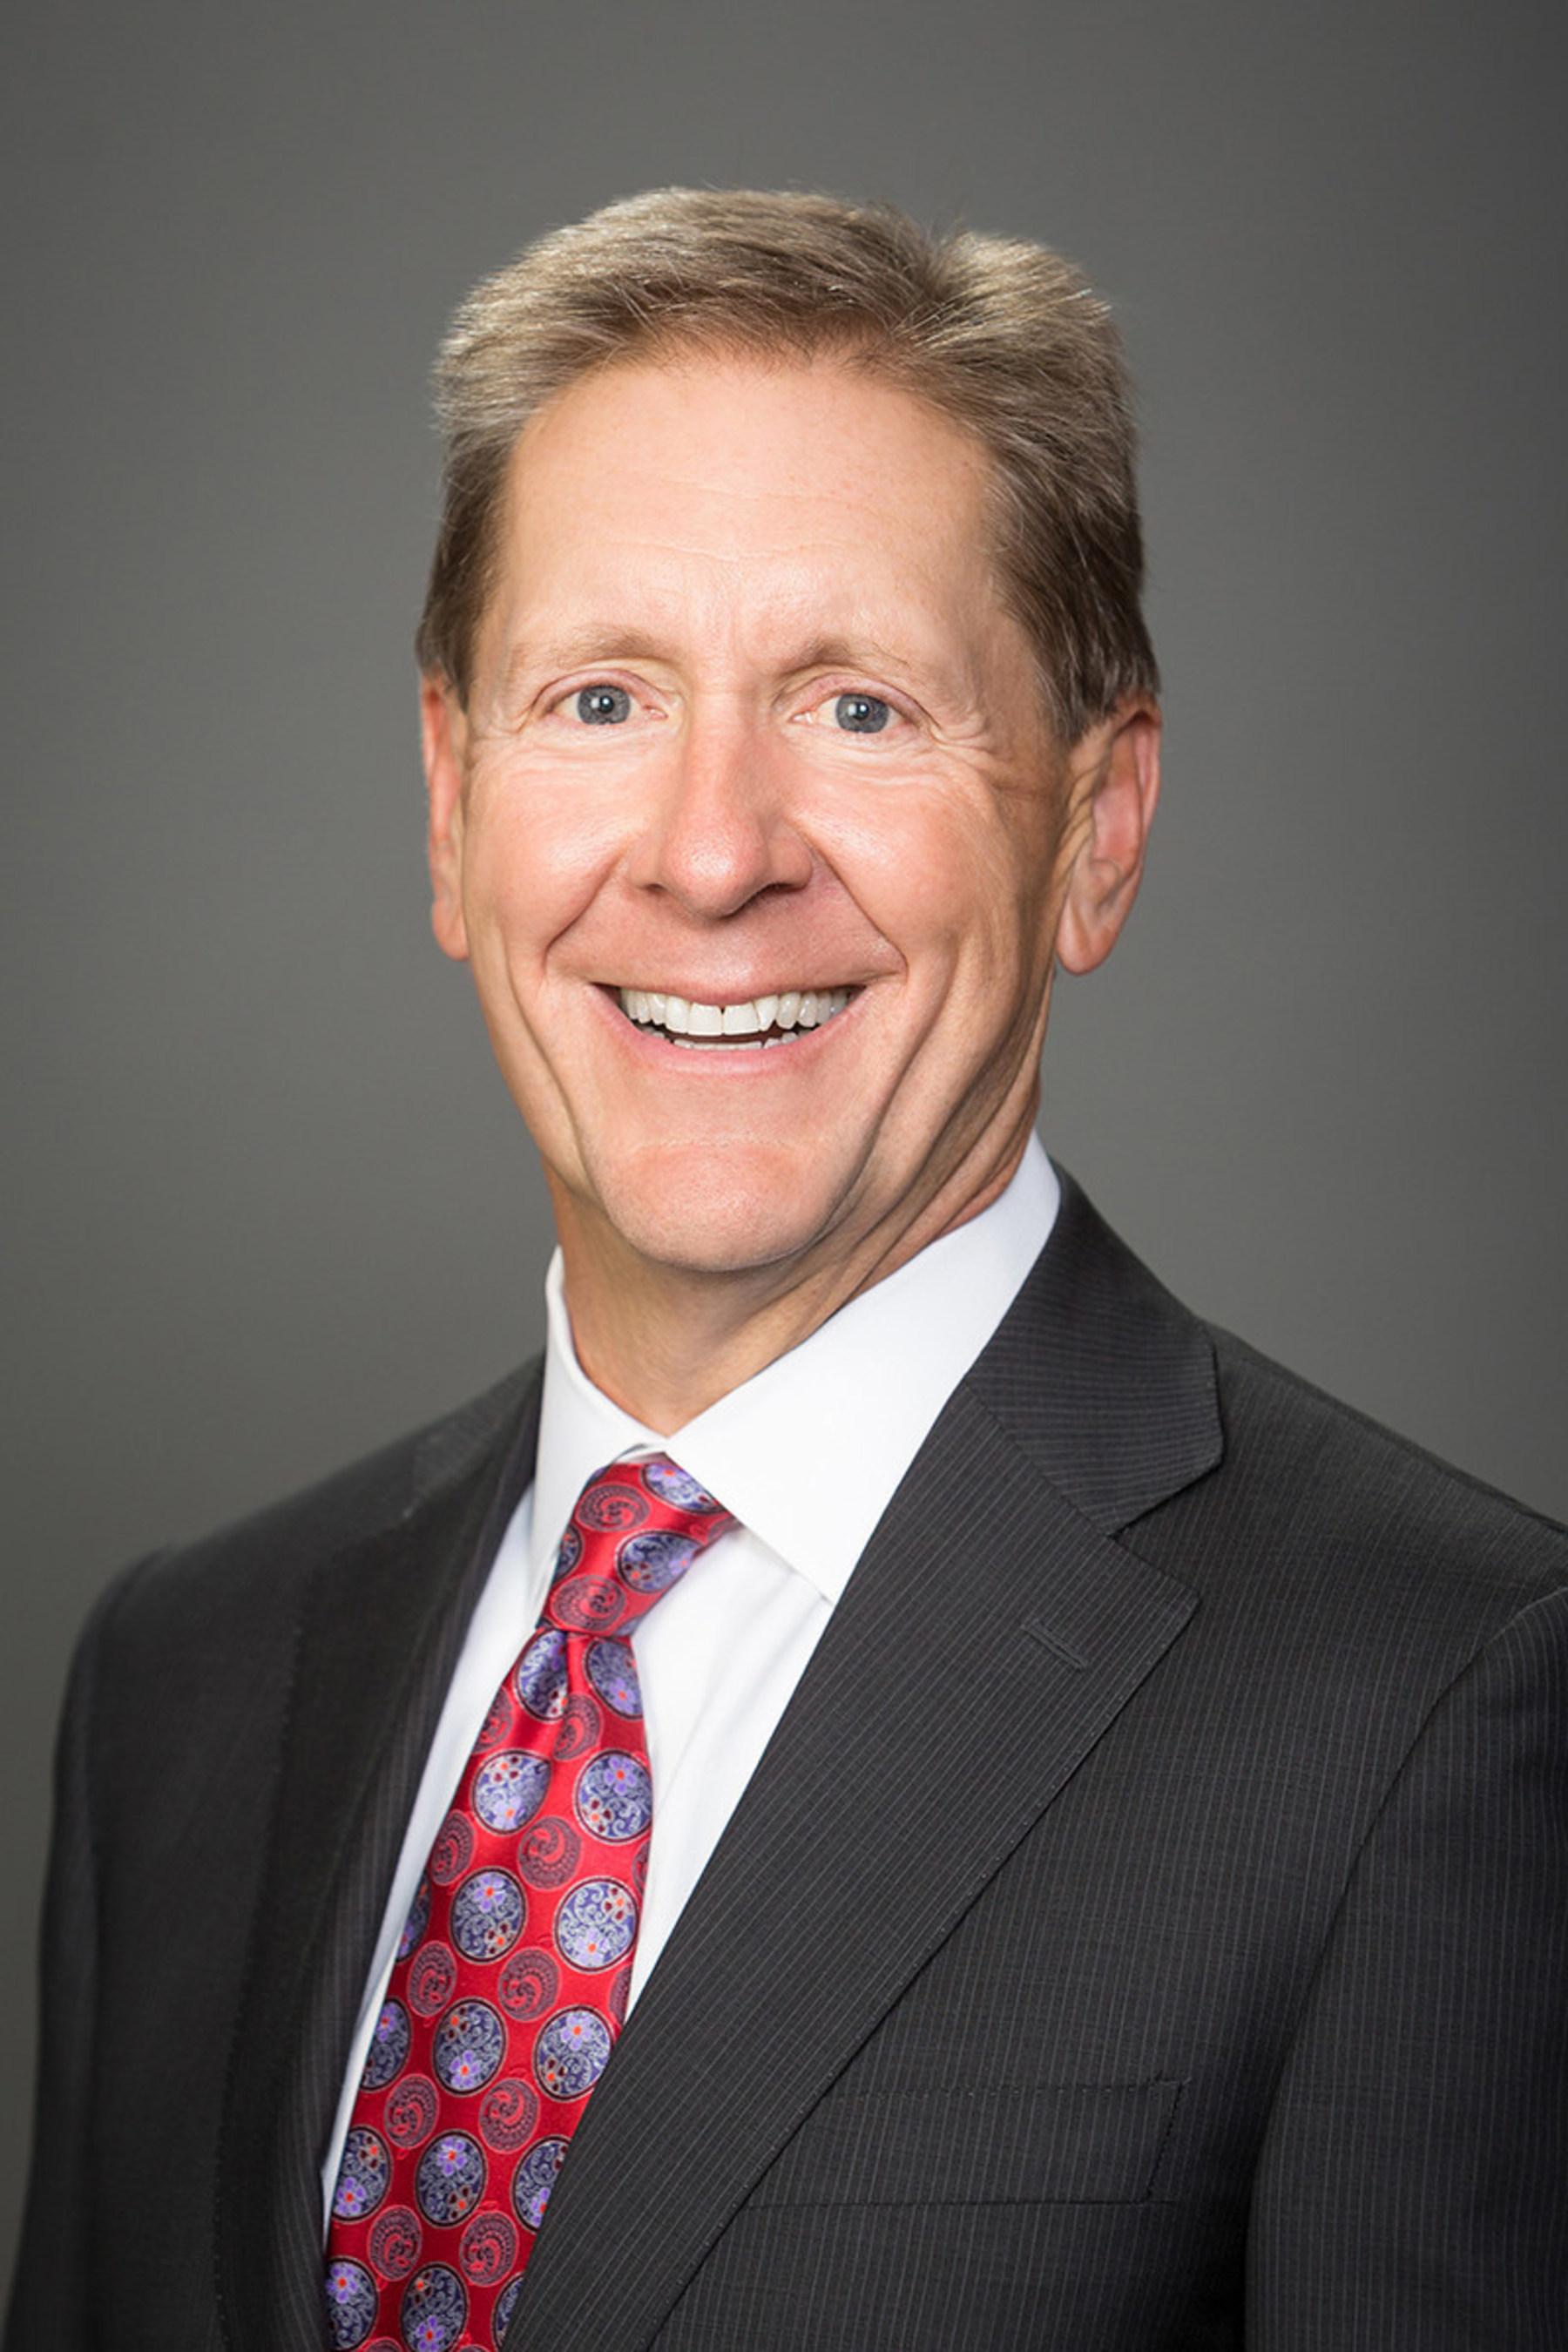 Jay Whitehurst, National Retail Properties